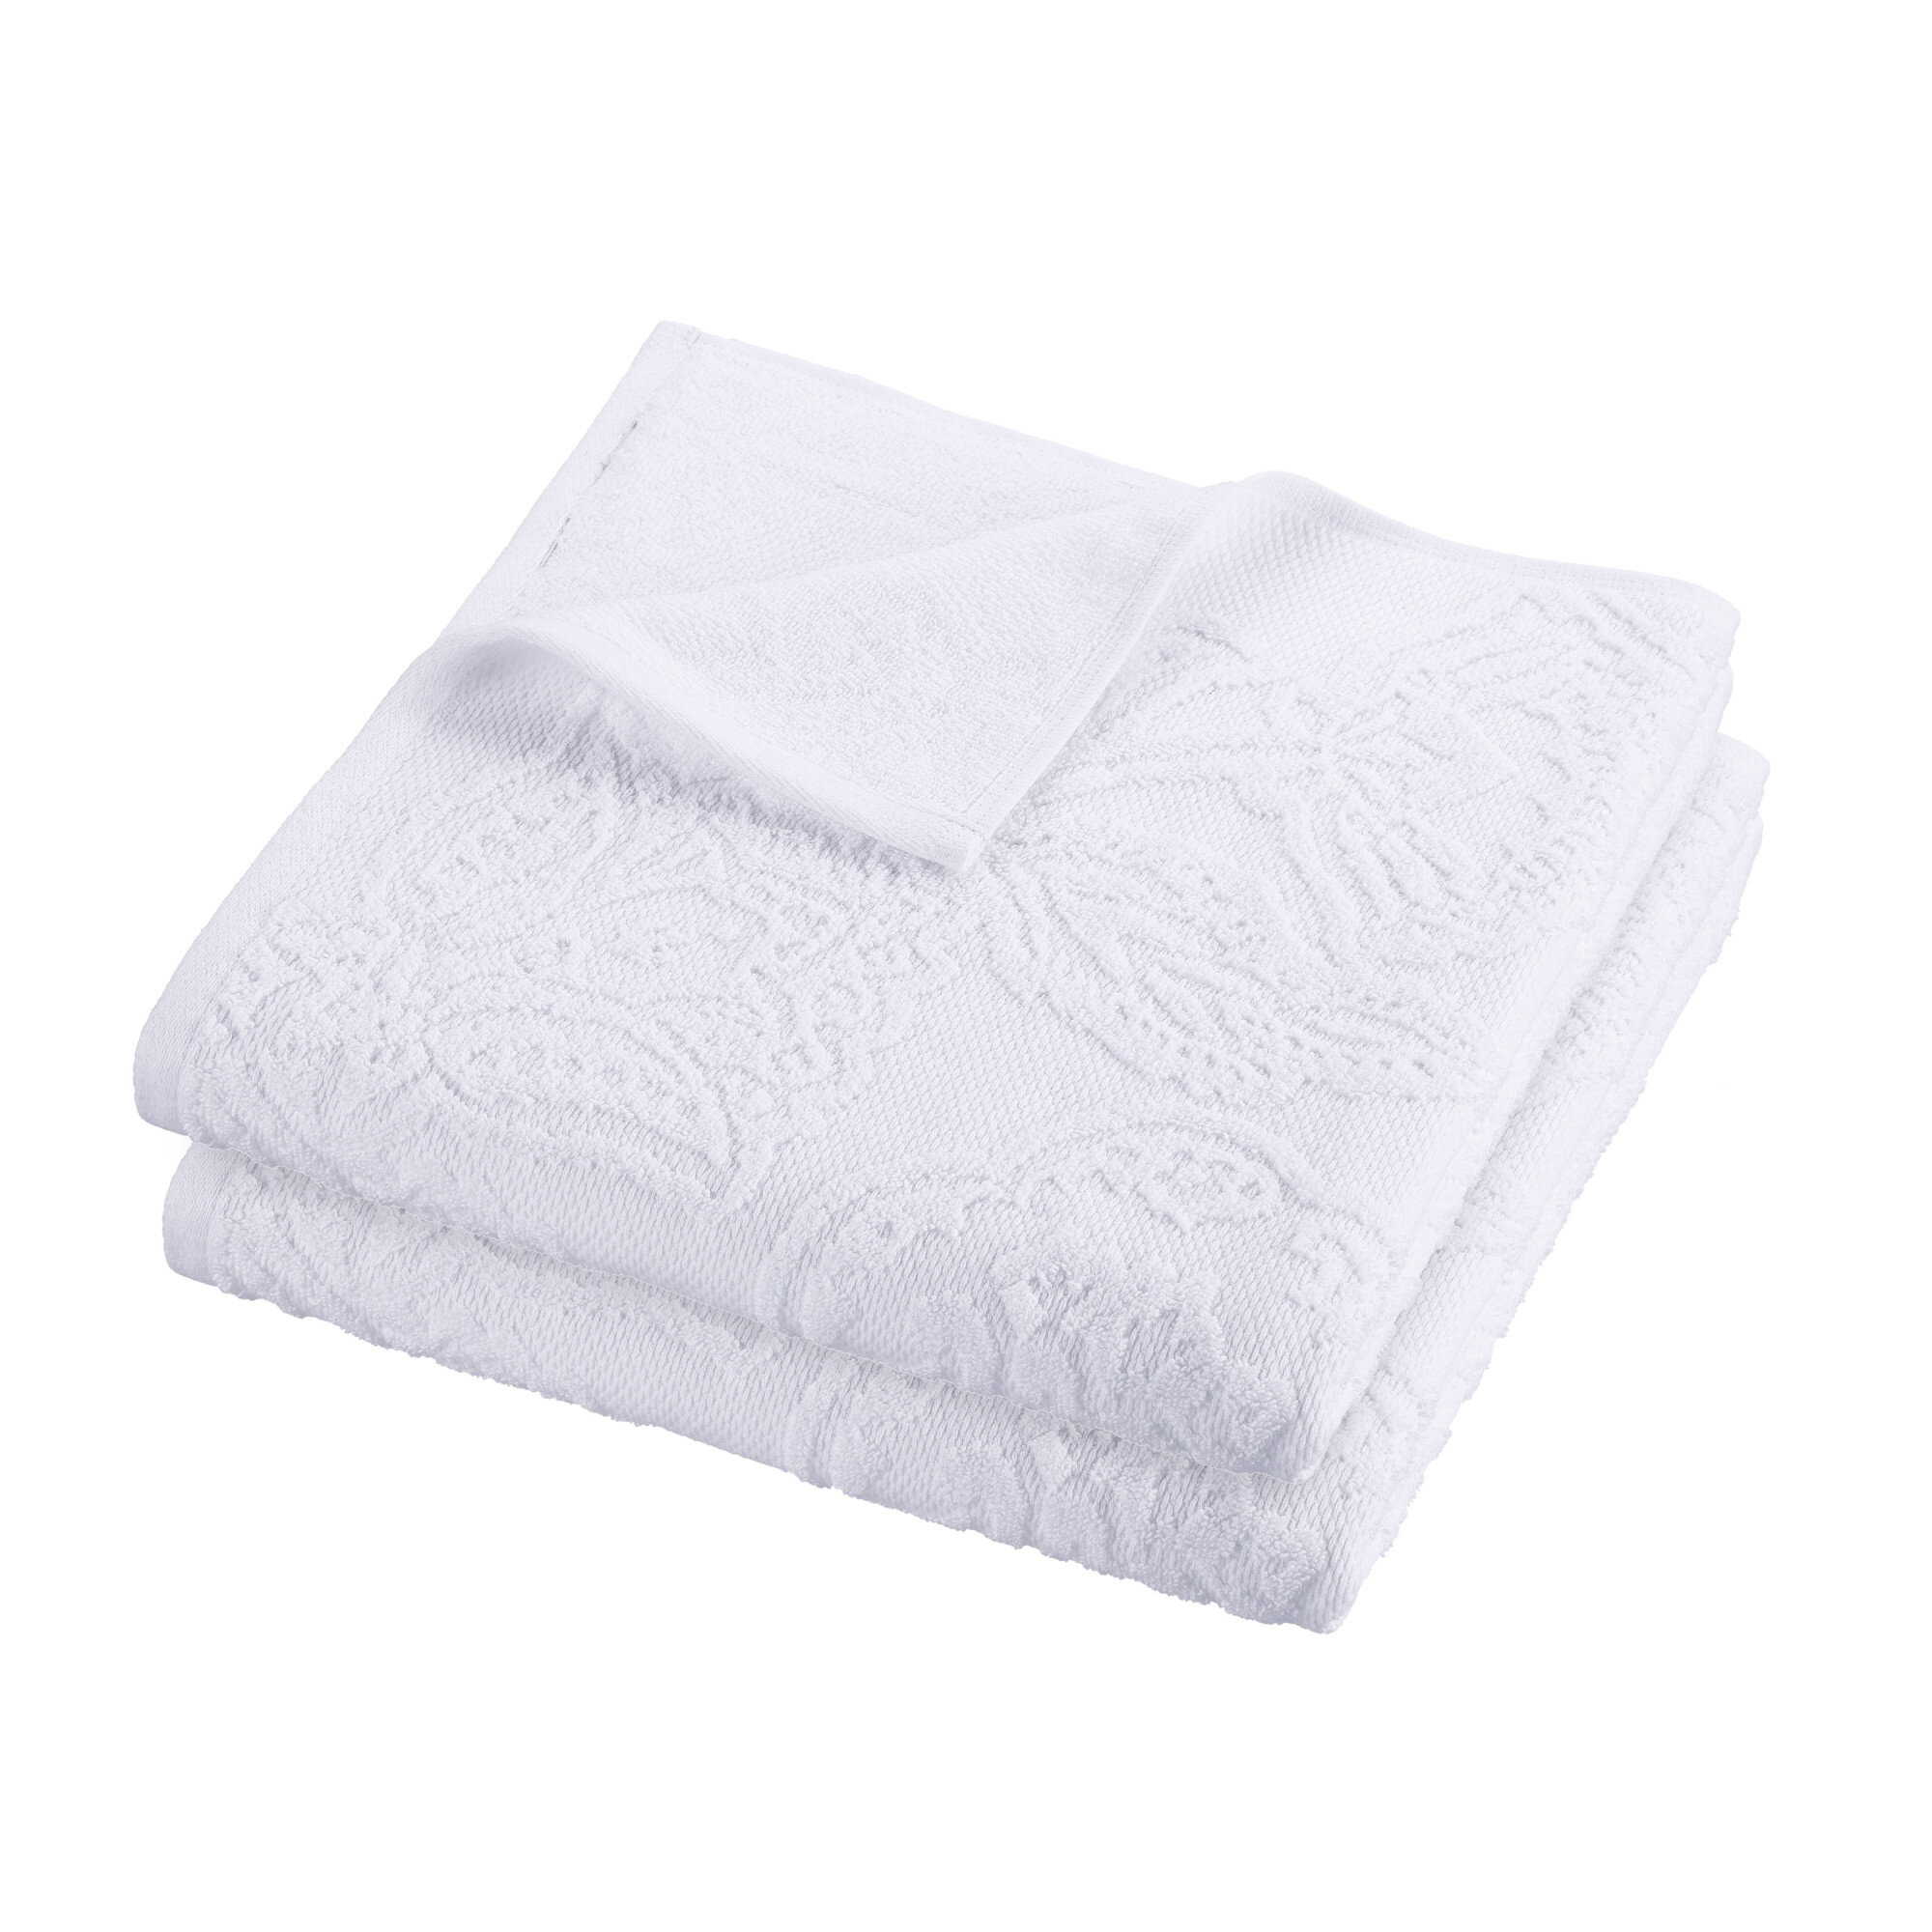 Floral Bath Towels You Ll Love In 2021 Wayfair